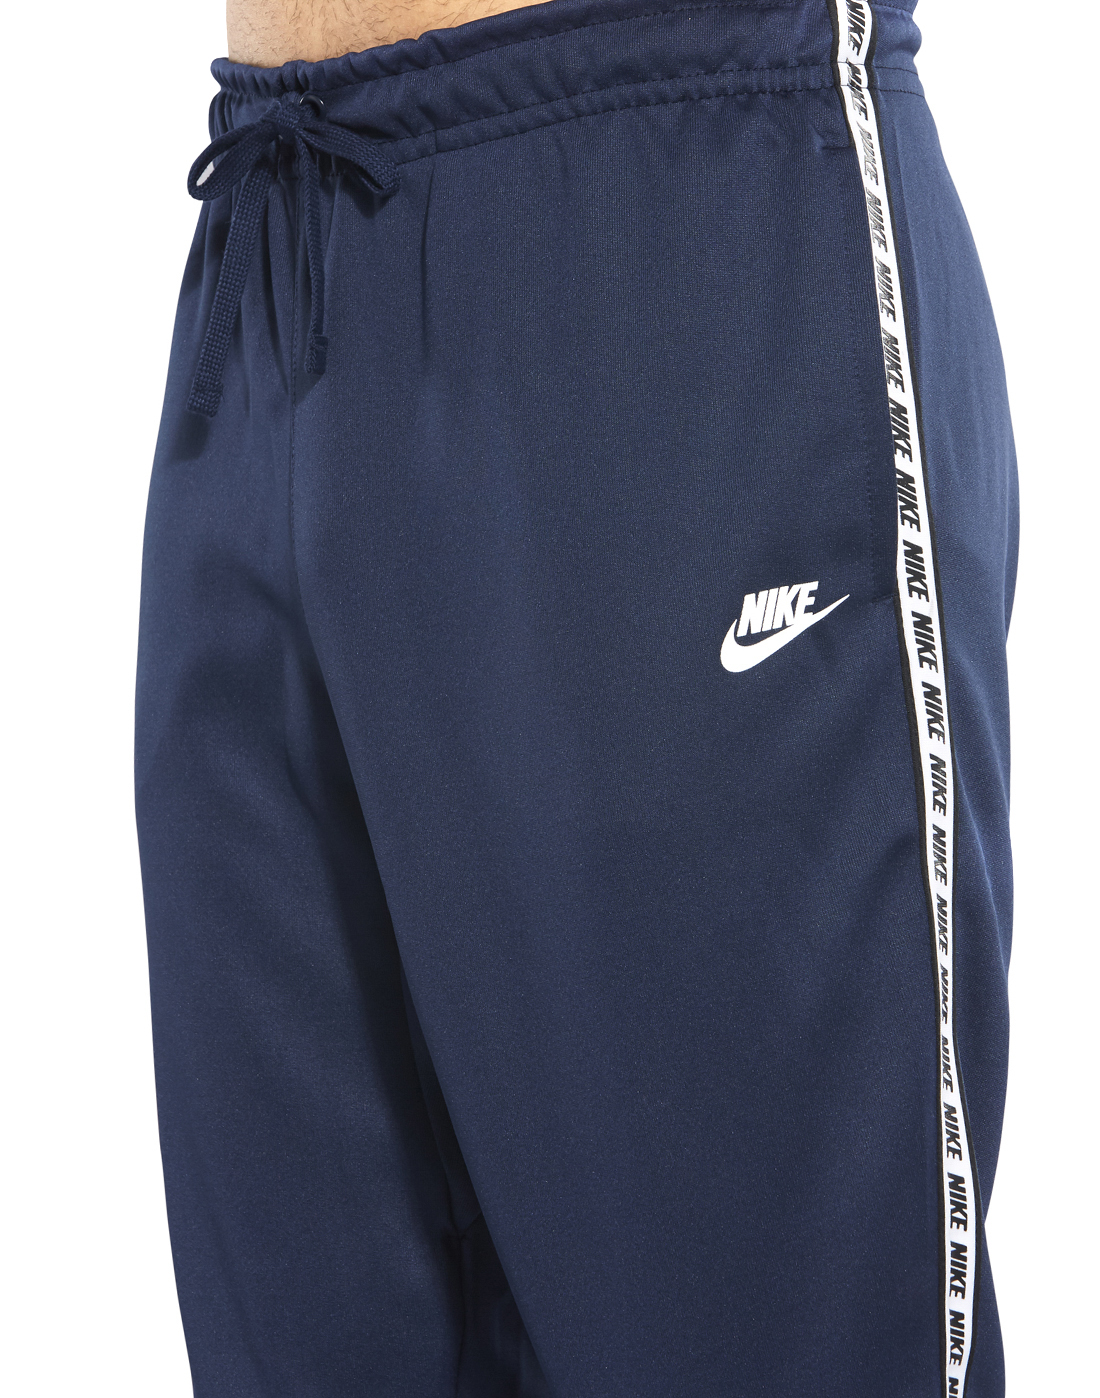 318fffeee Men s Navy Nike Logo Tape Track Pants